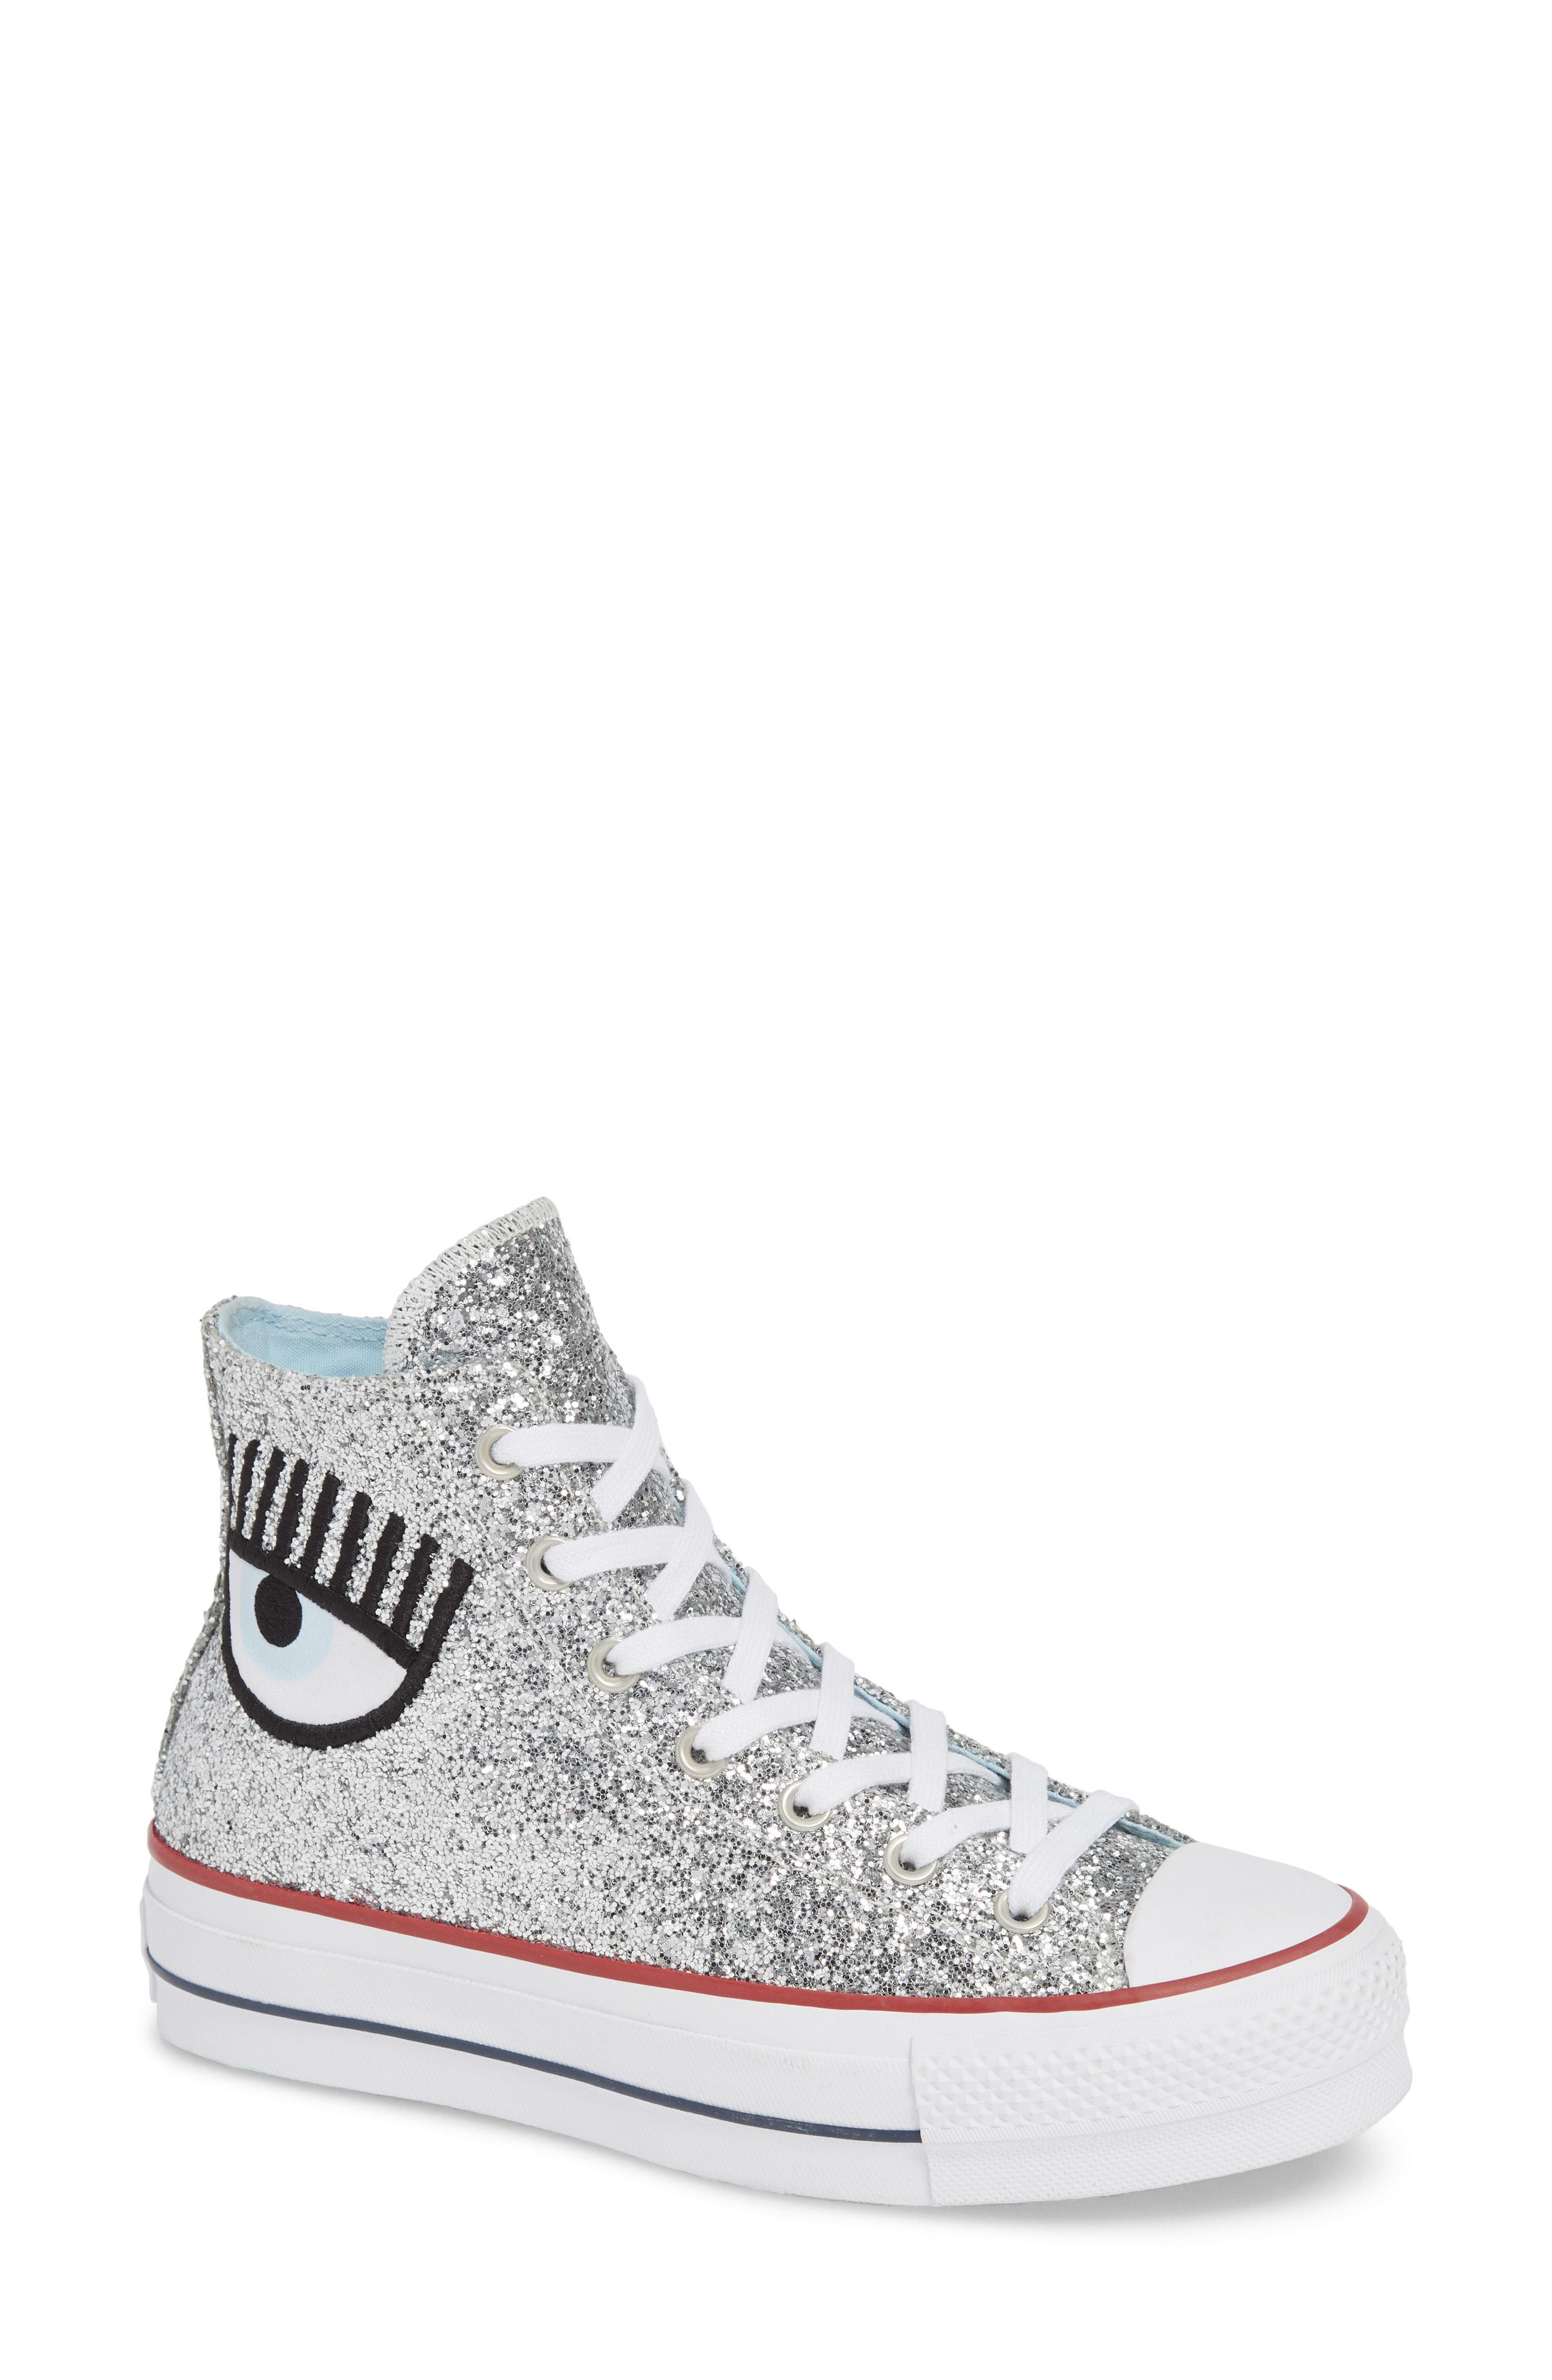 5b7844bcf Converse X Chiara Ferragni 70 Hi One Star Glitter Platform Sneaker ...